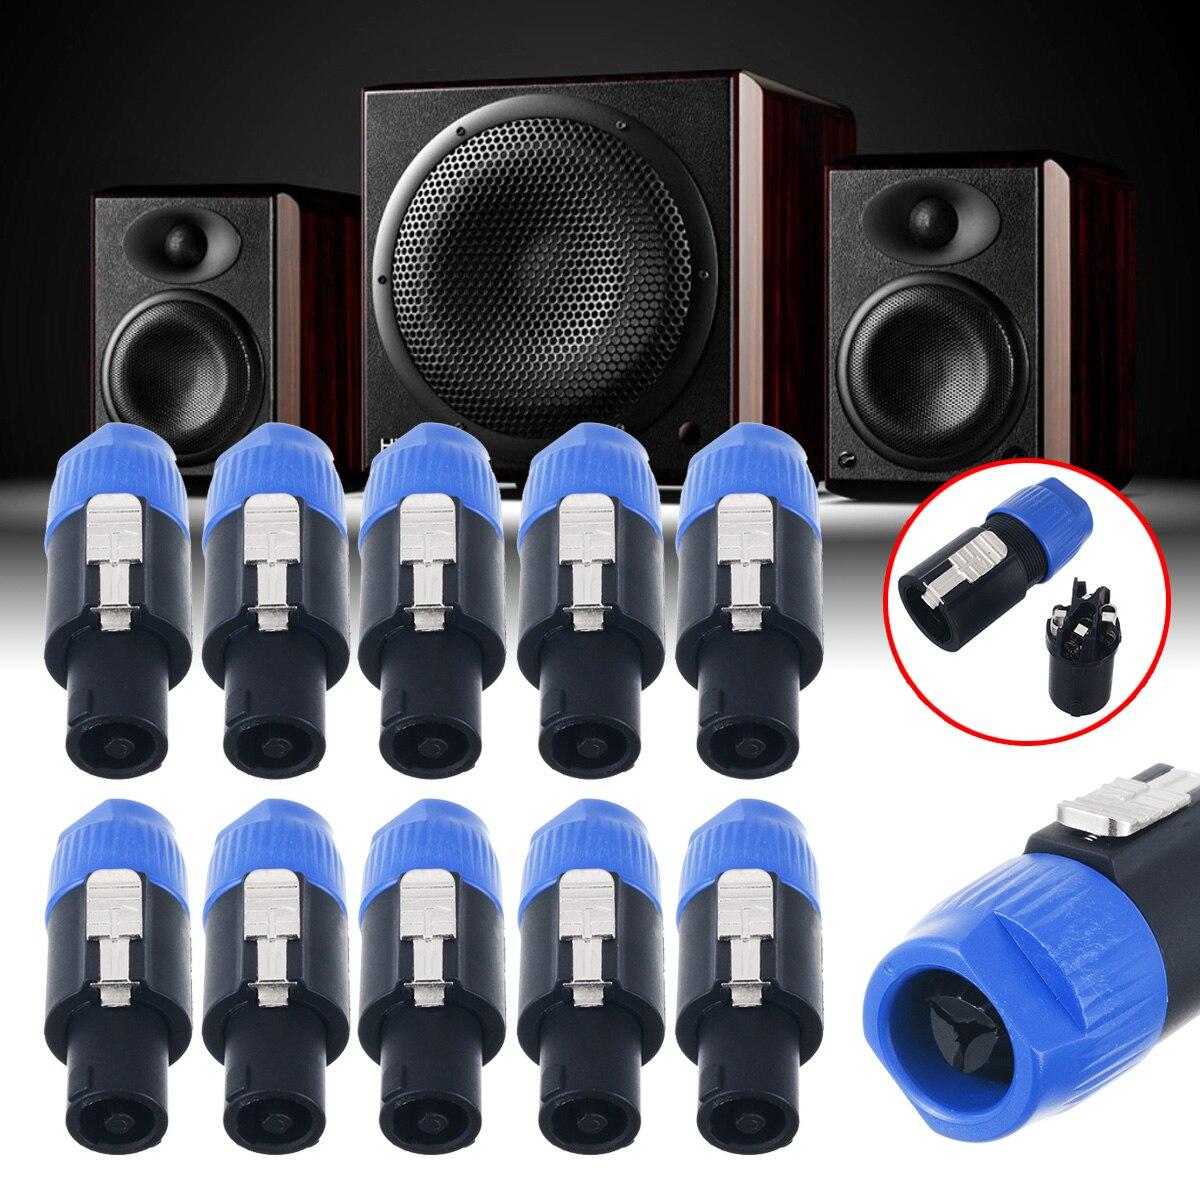 10pcs Professional Copper Core Speakon Connector Chuck Type 2 Pin Male Plug Compatible Audio Wire Cable Connectors